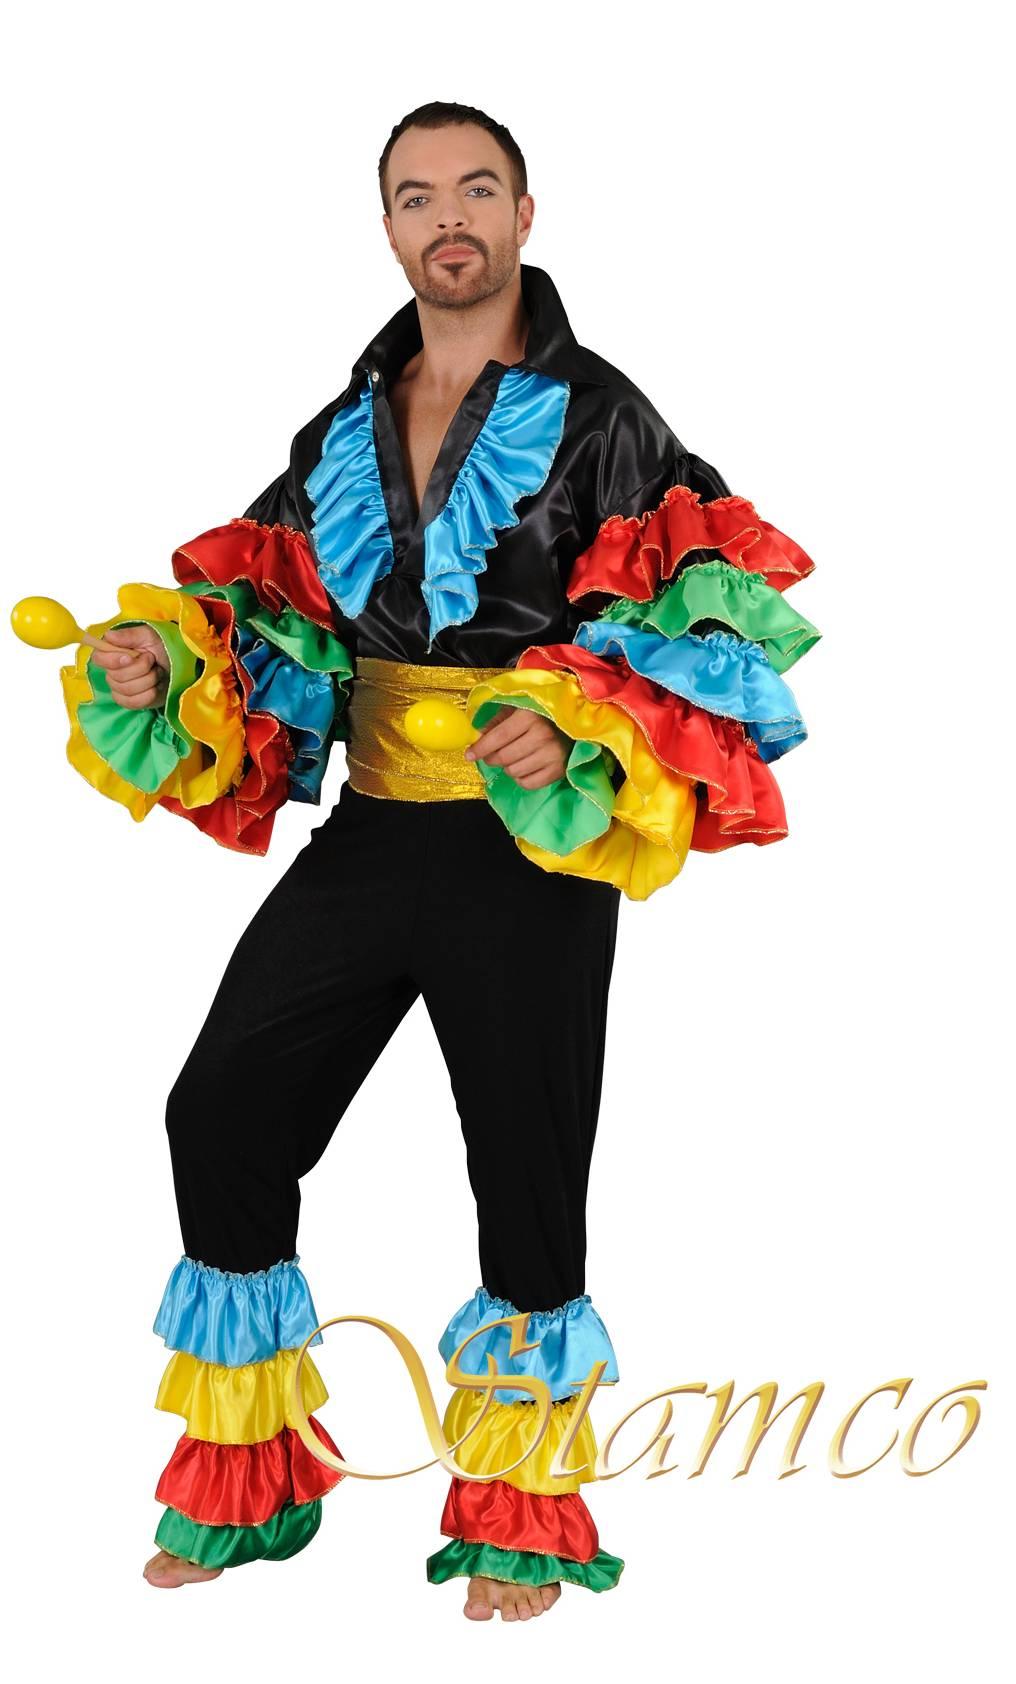 Costume Homme Carnaval De Rio Deguisement Chemise Rio